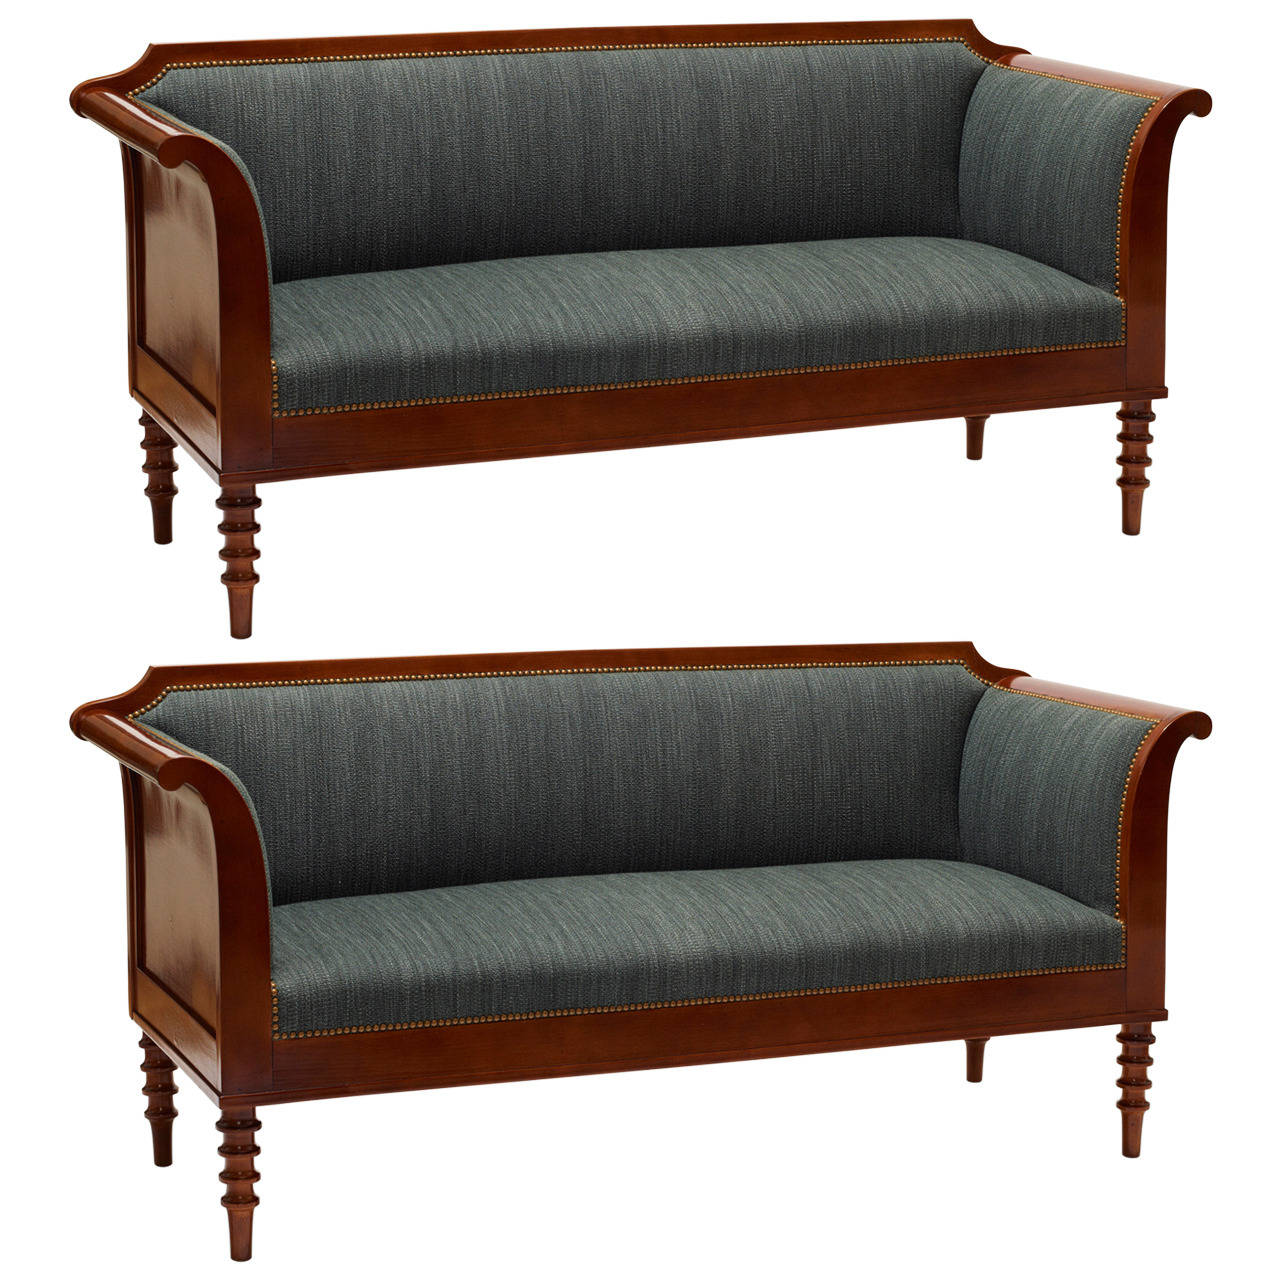 settees for sale vintage settee for sale at 1stdibs settees on sale 28 images sofa. Black Bedroom Furniture Sets. Home Design Ideas